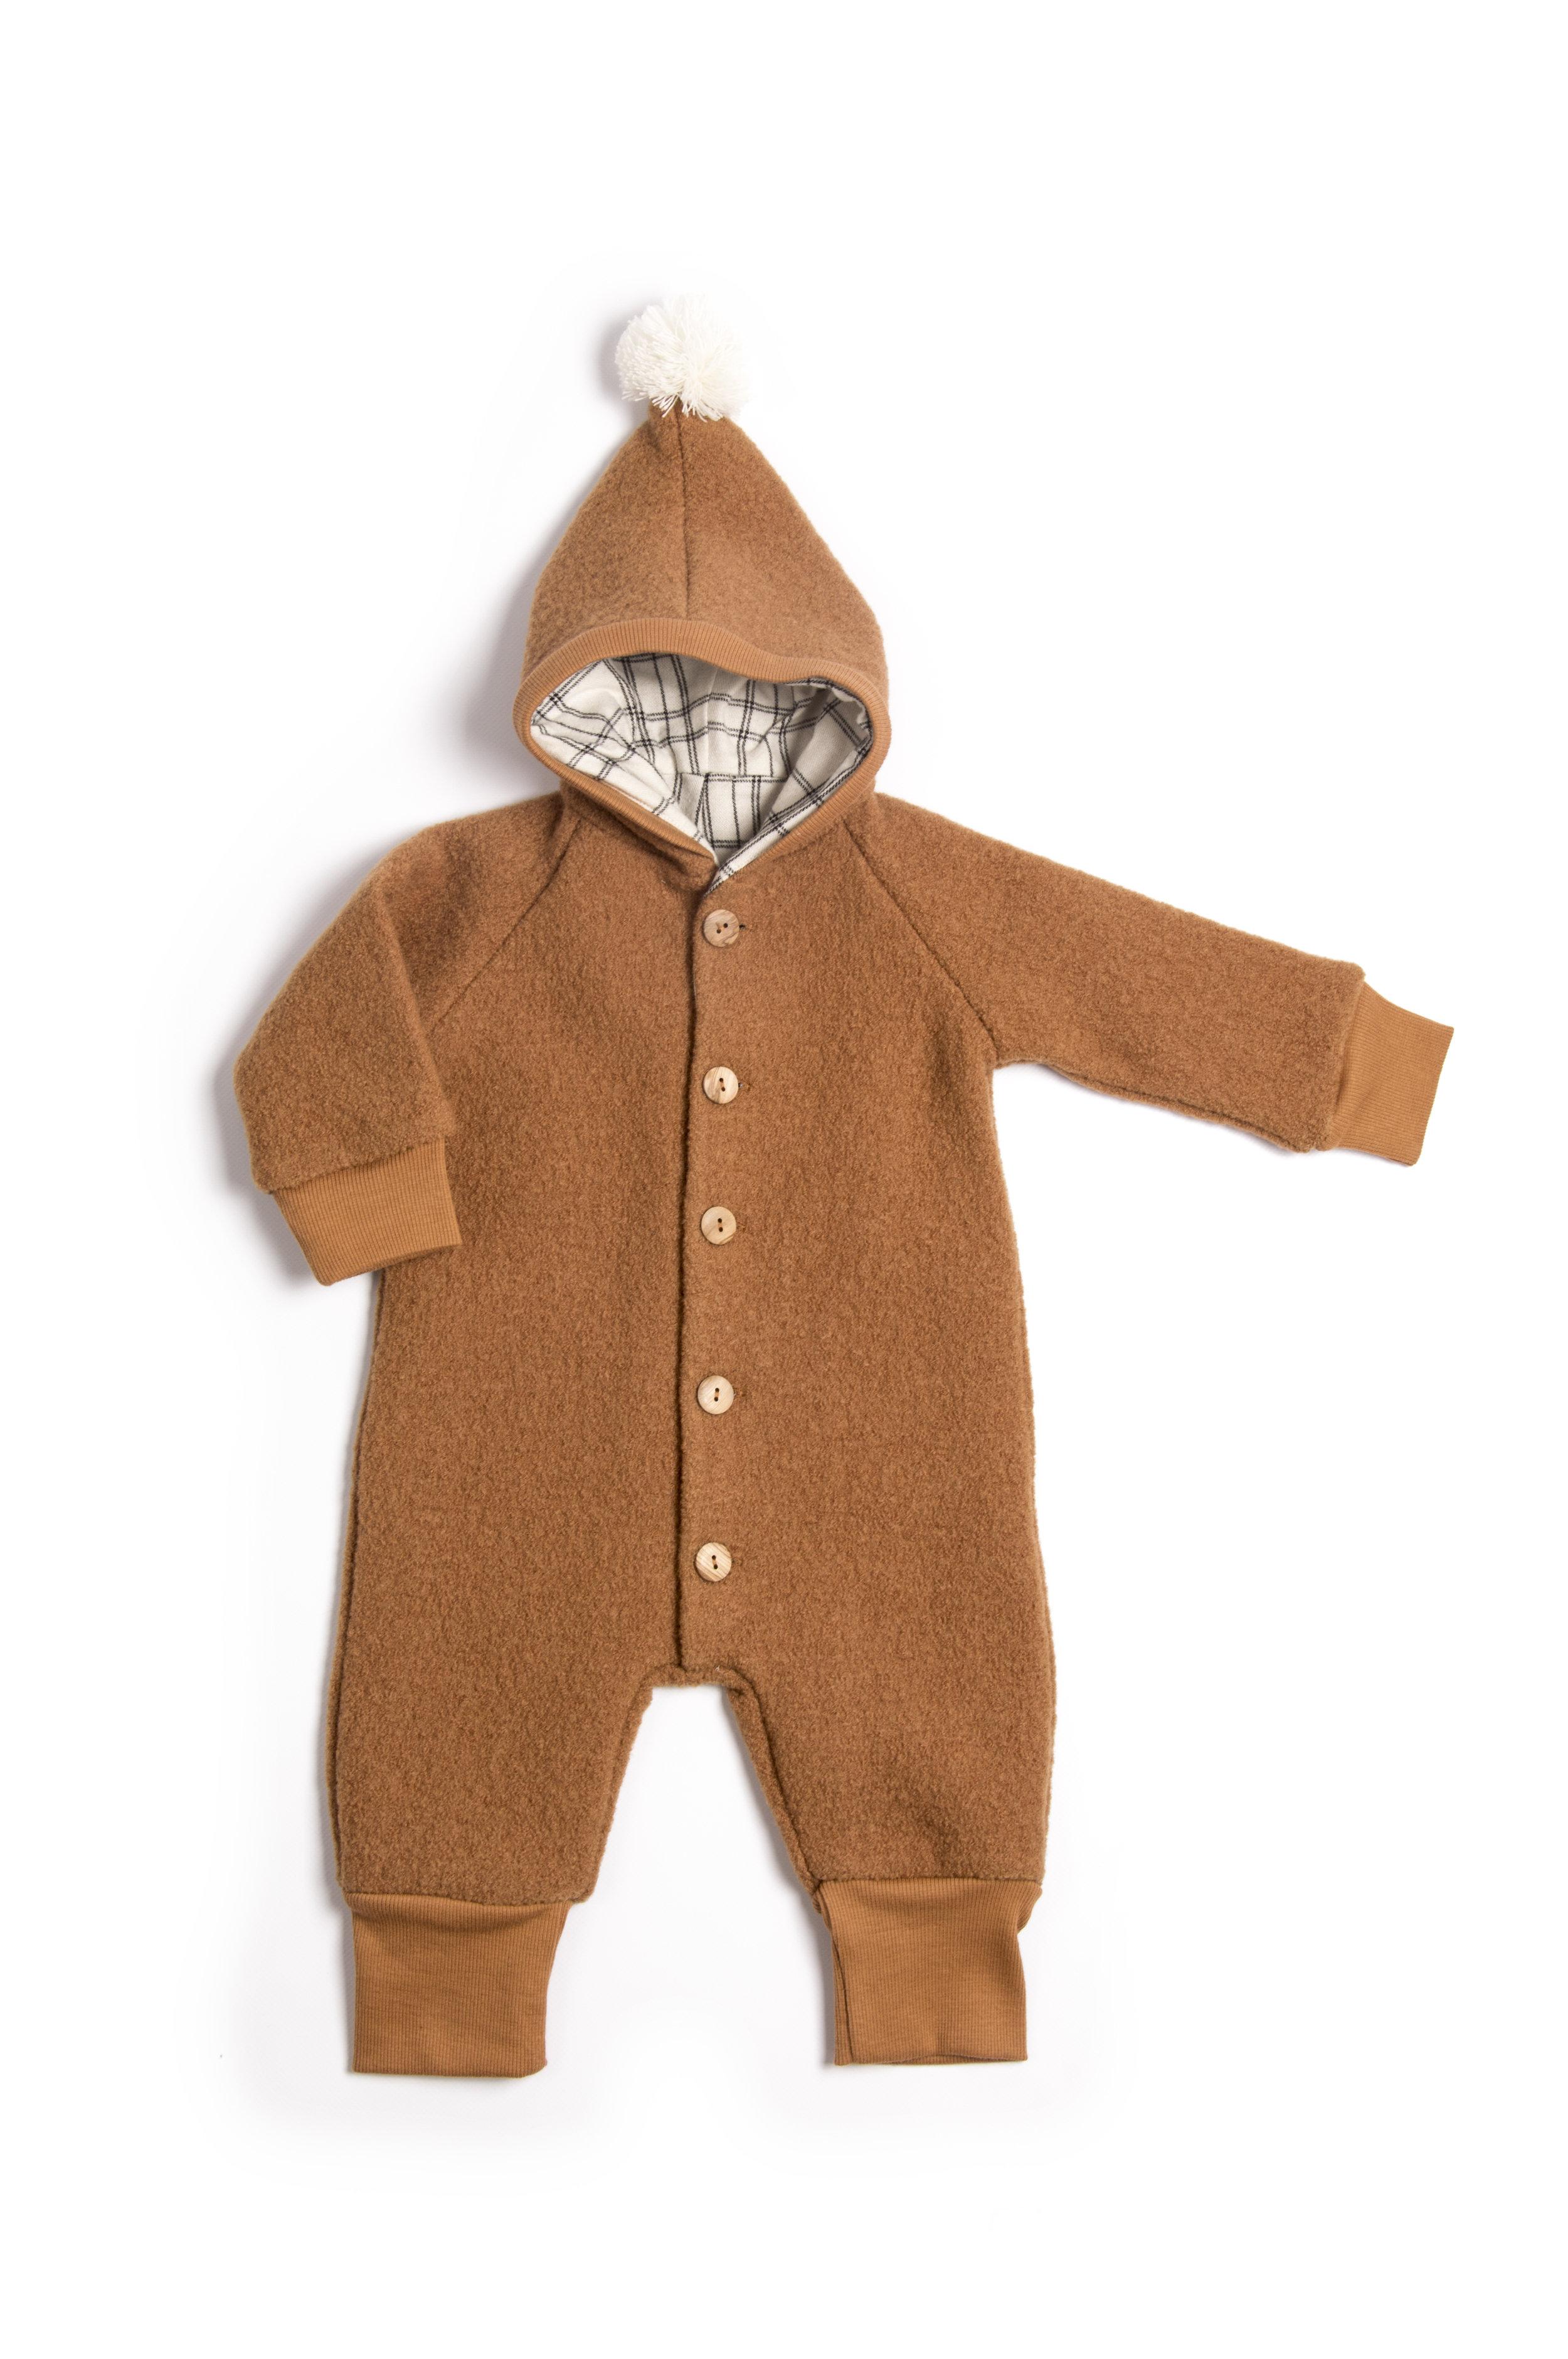 monkind-aw18-terracotta-suit_01.jpg